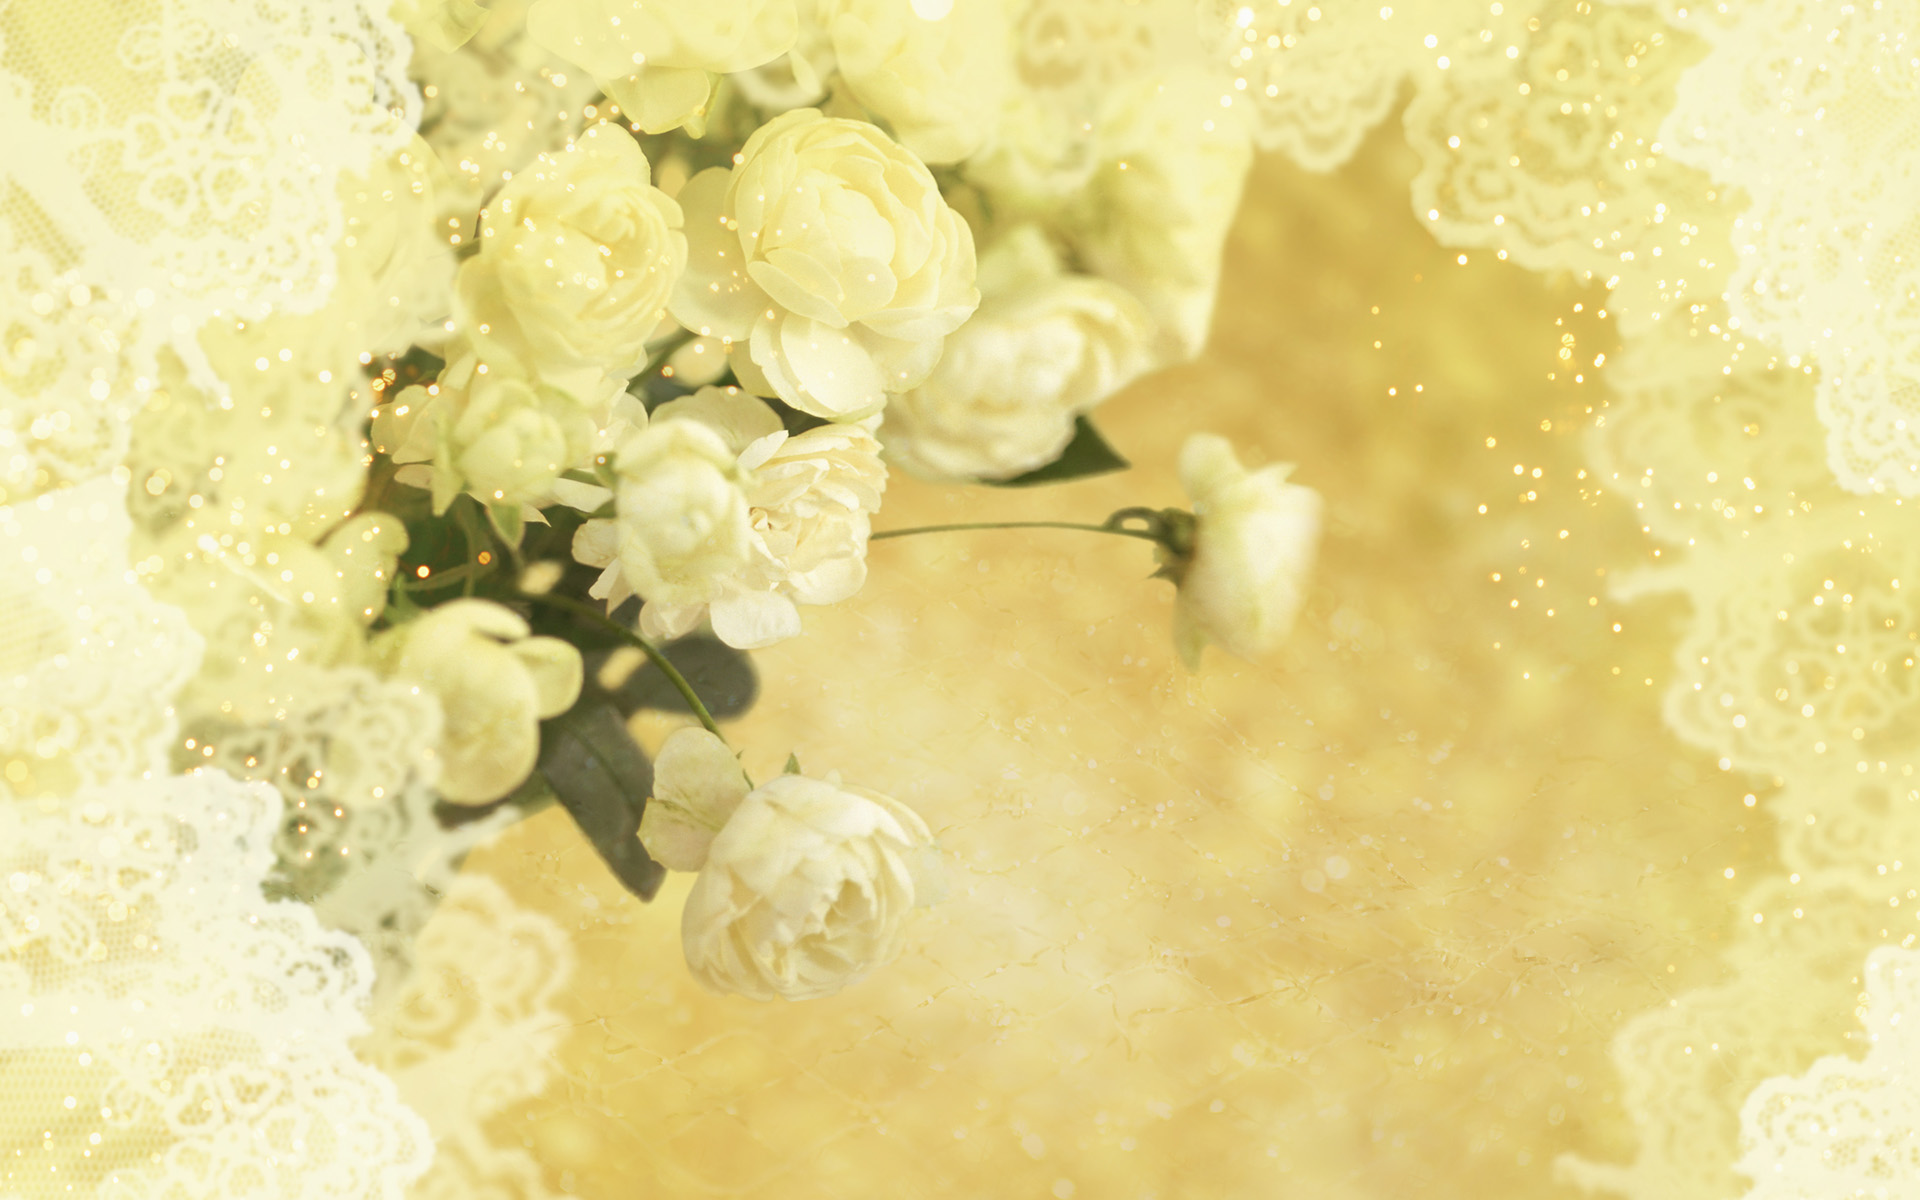 5aaa14d15be4 Download Wedding Wallpaper 2531 1920x1200 px High 1920x1200